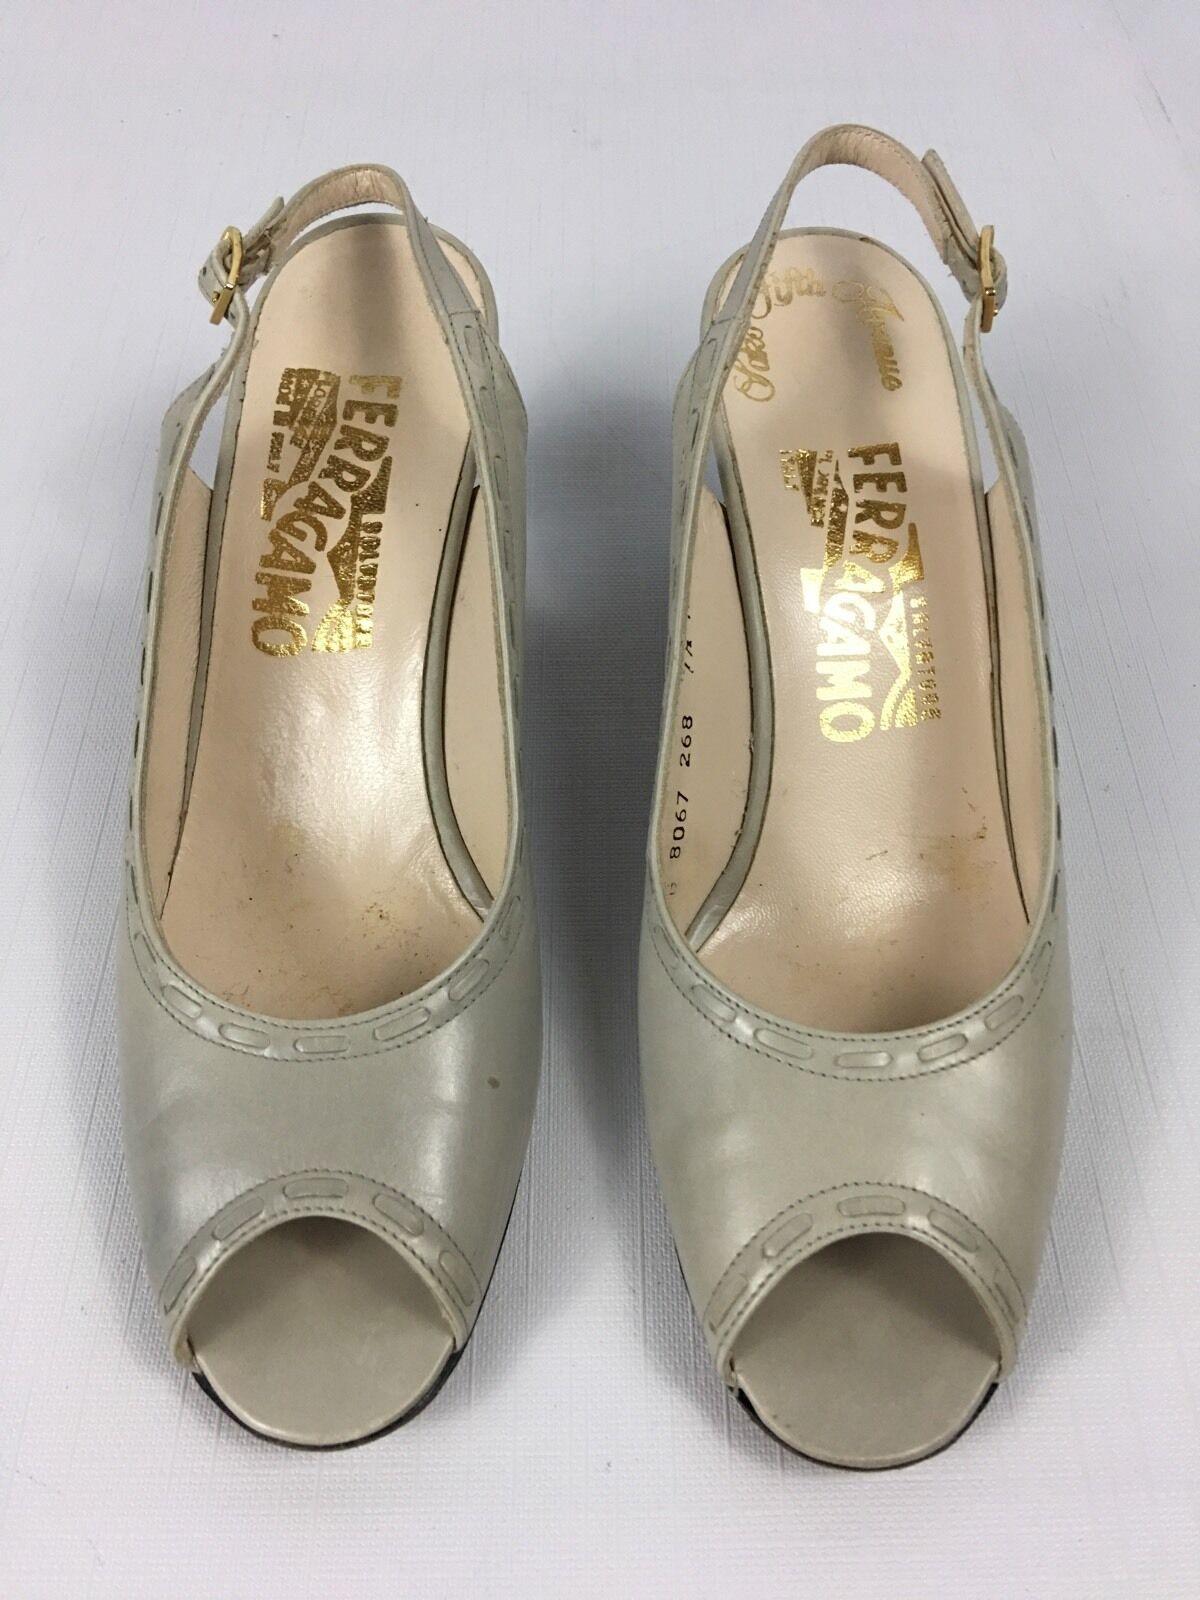 Women's Vintage Ferragamo Salvatore Ferragamo Vintage Gray Open Toe Slingback Heel Pumps 7.5 AAA 957d06